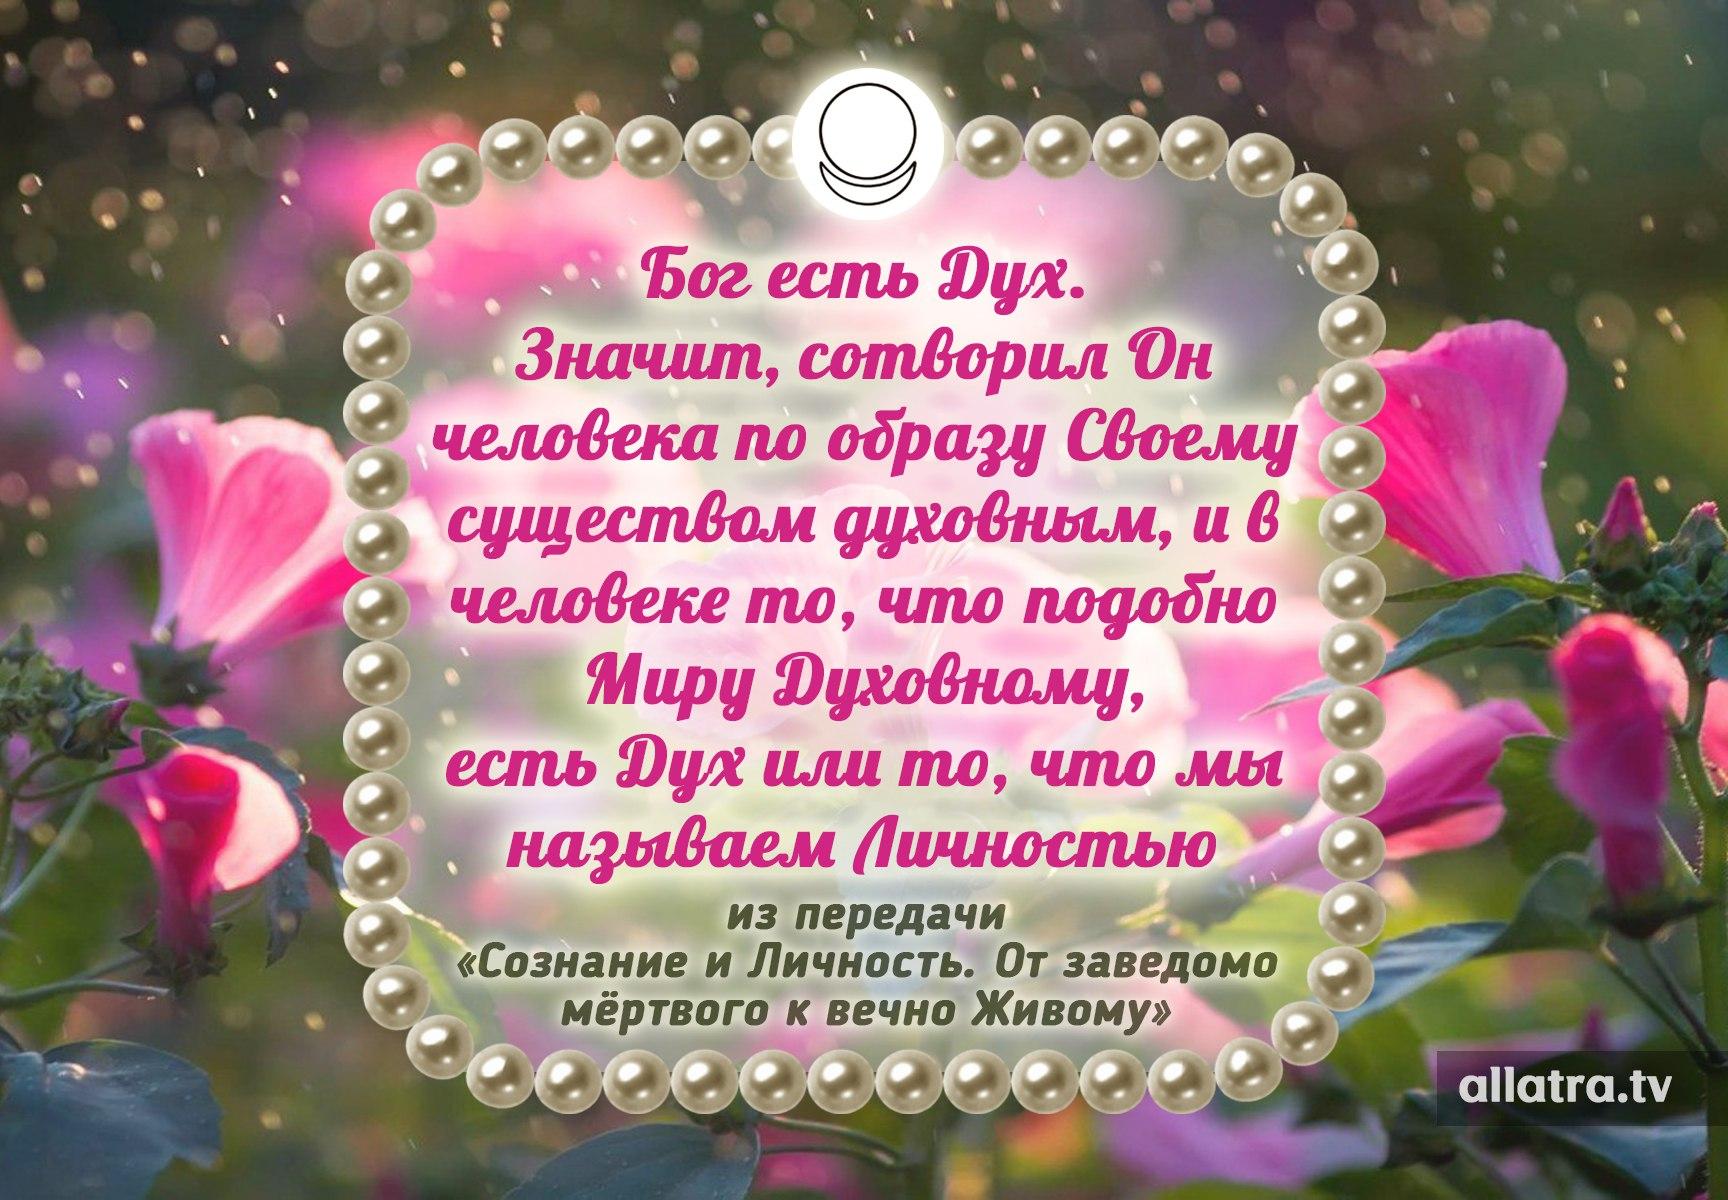 https://pp.userapi.com/c841532/v841532301/3094e/6Z-GpsJkU3Y.jpg